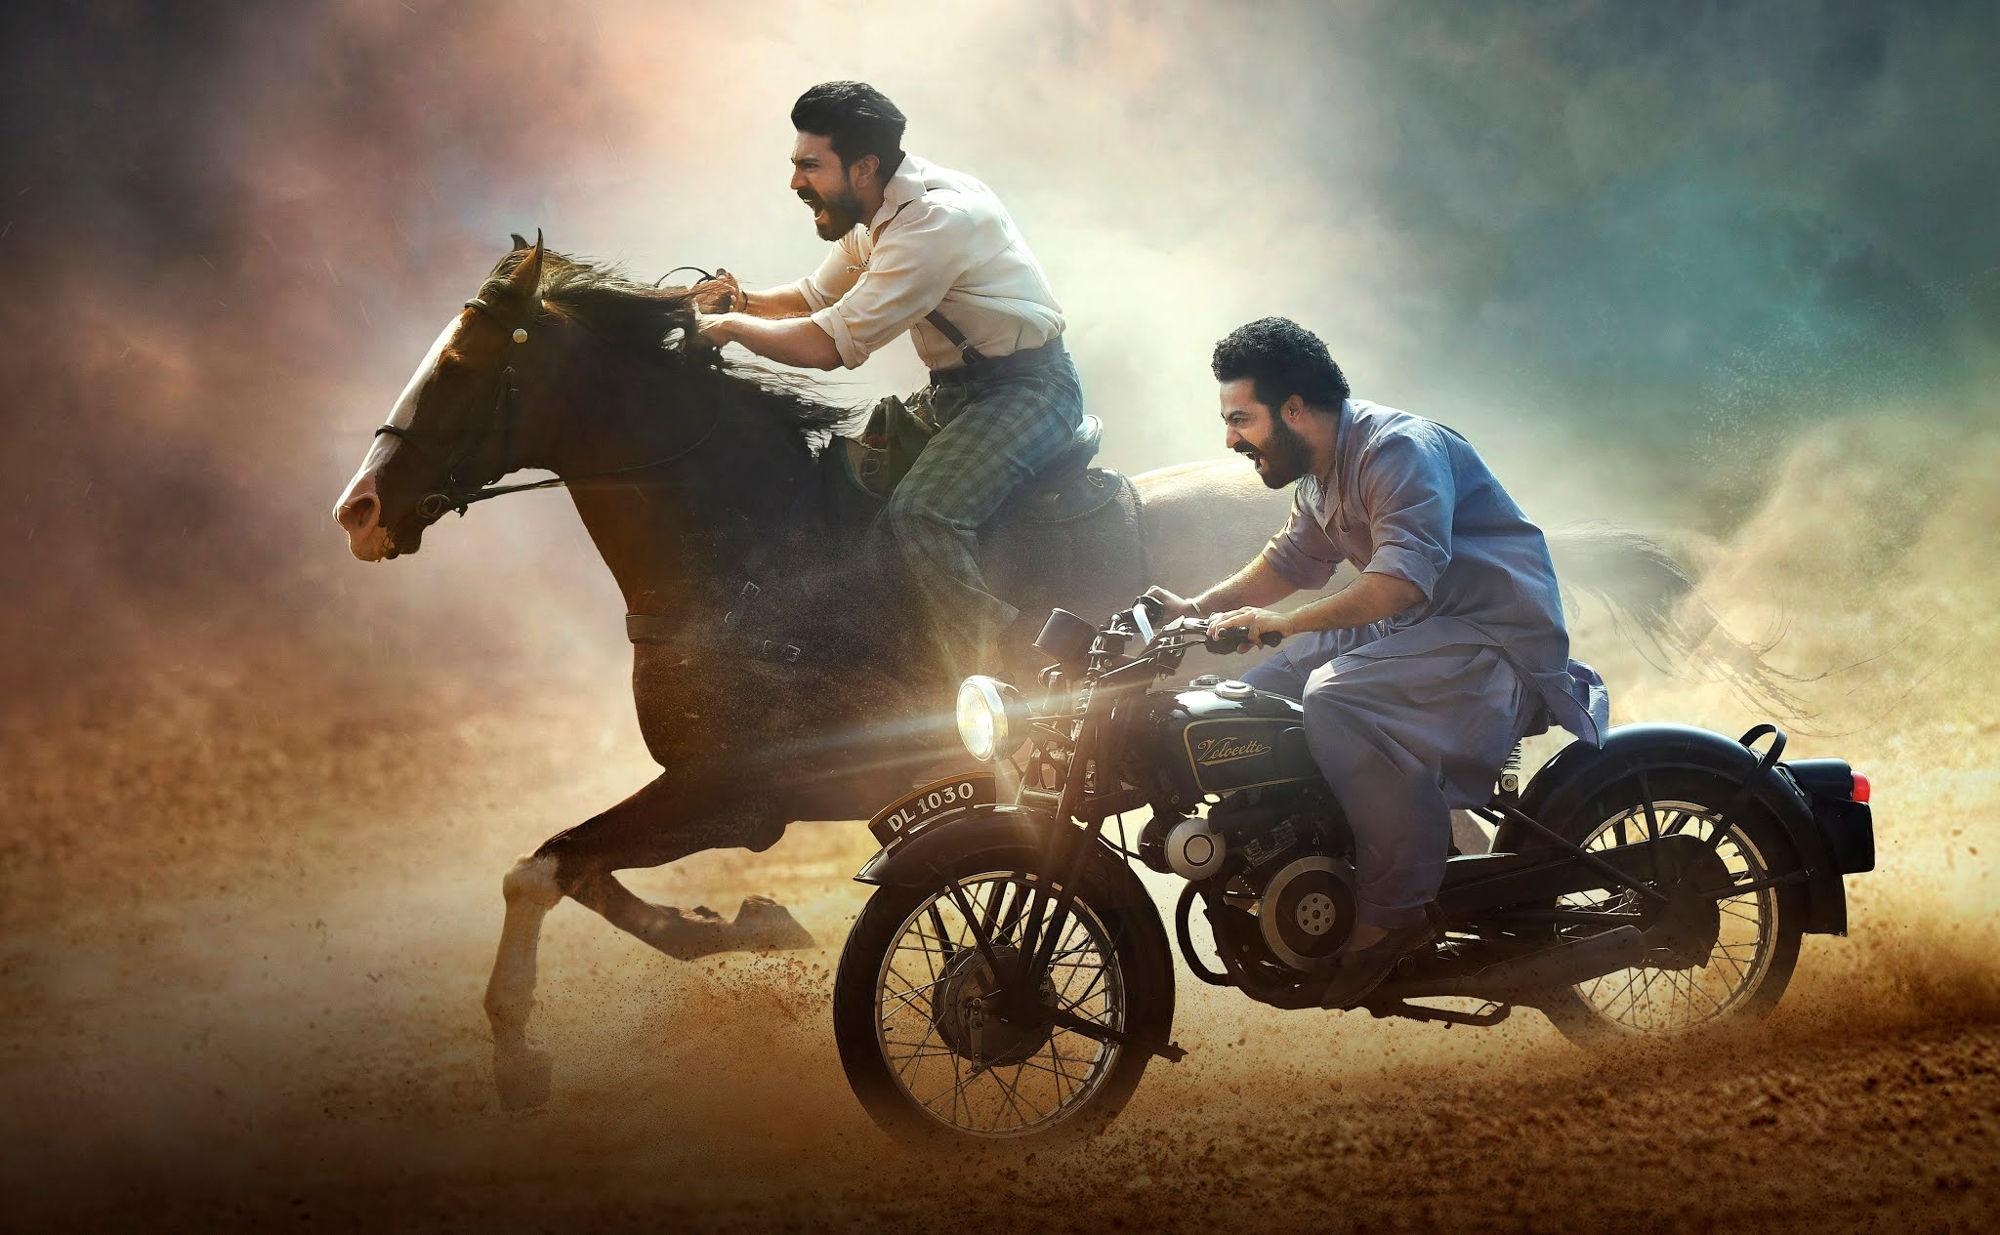 Ram Charan NTR RRR Movie Dussehra Worldwide release on October 13, 2021